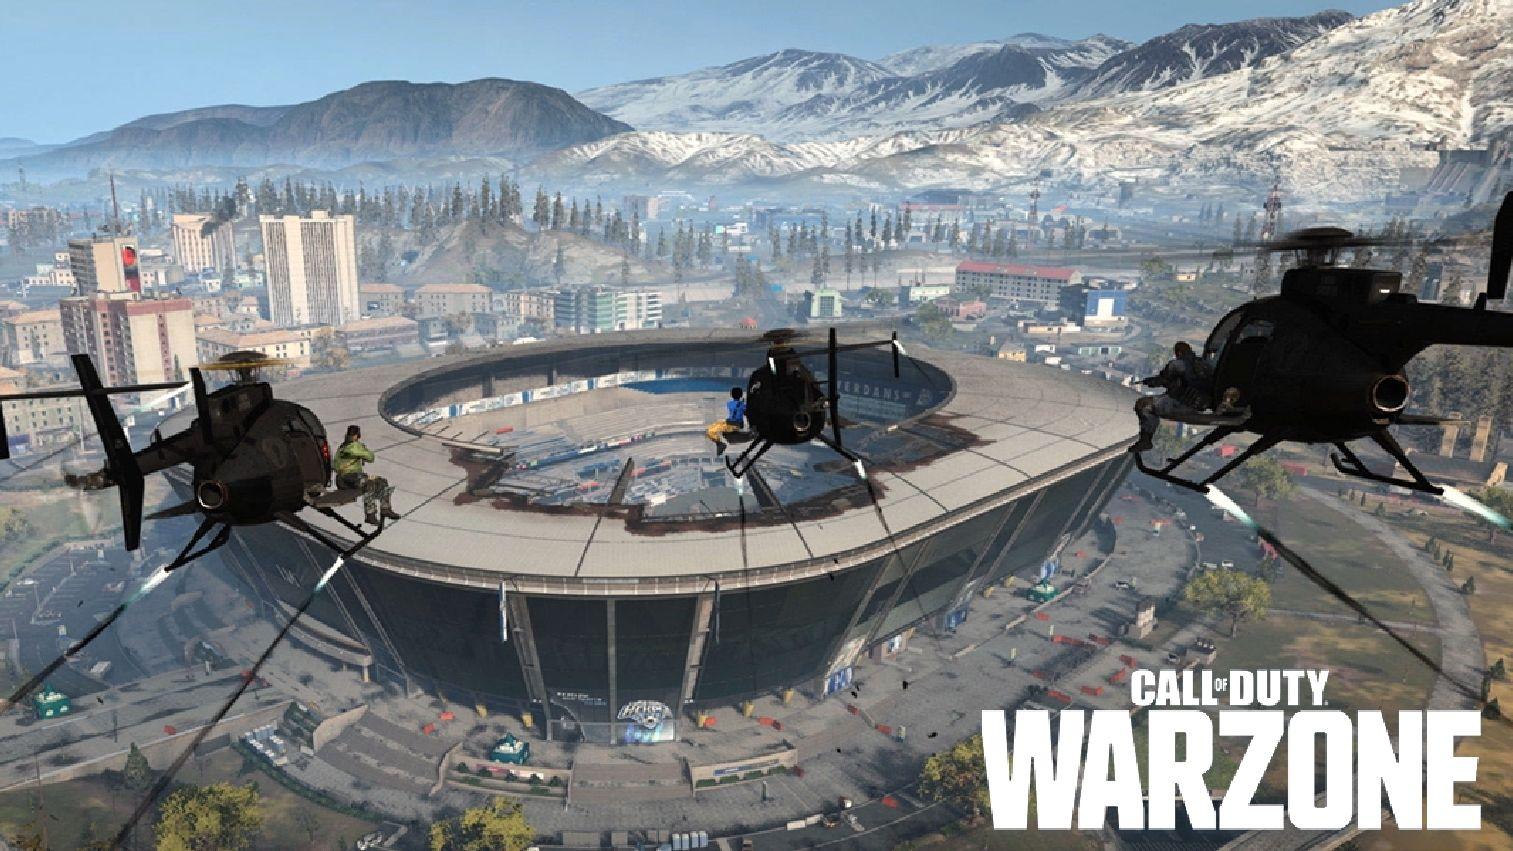 Warzone stadium verdansk